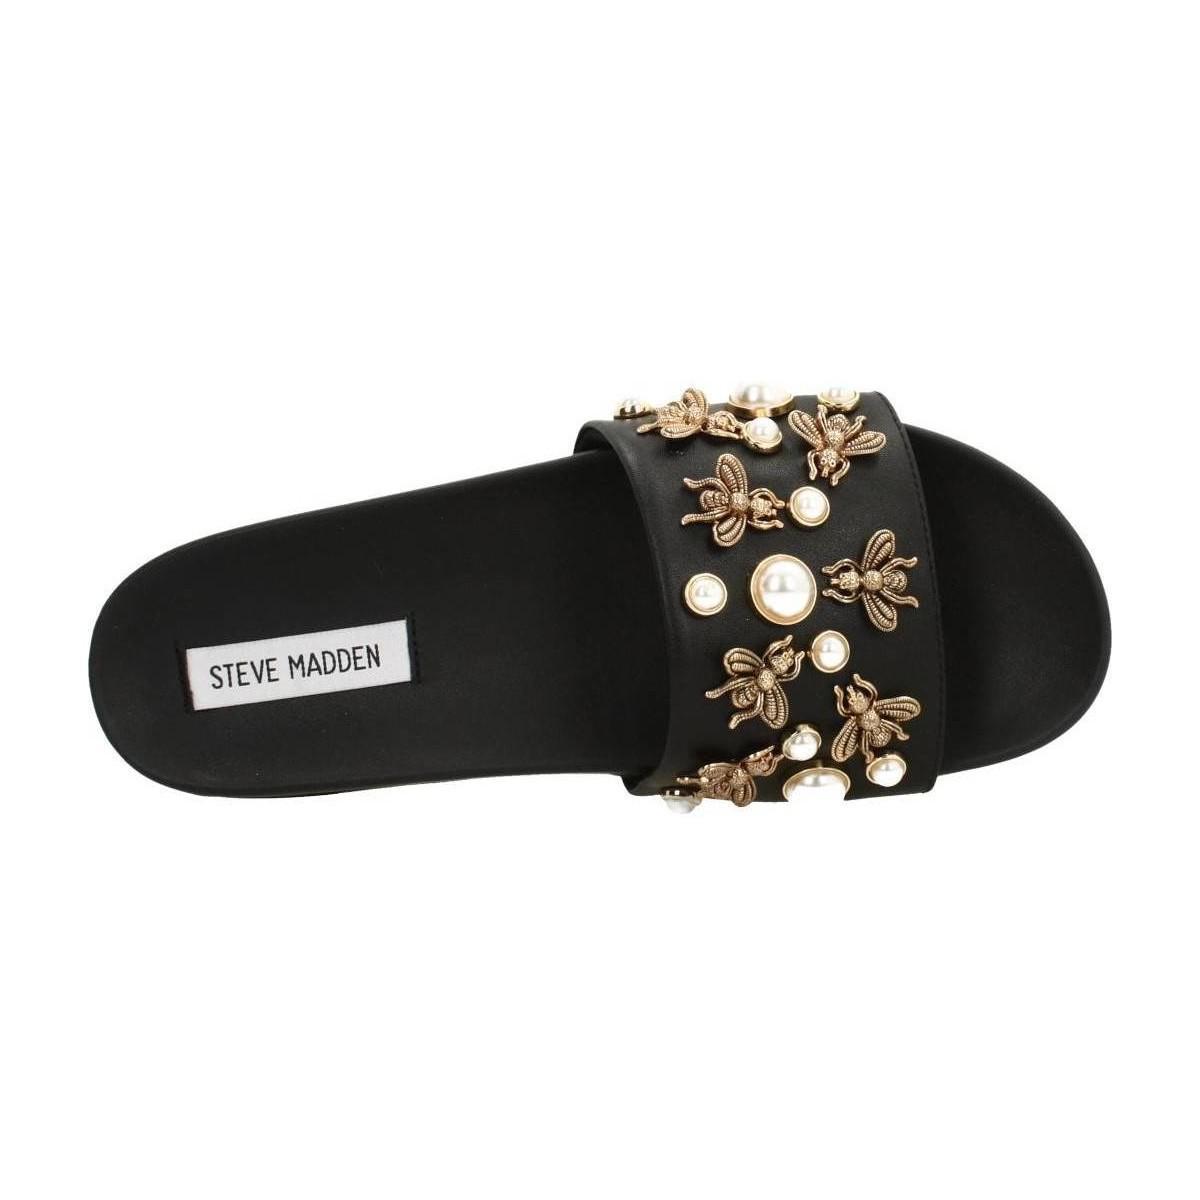 78772ac2945 Steve Madden Adorn Women s Sandals In Black in Black - Lyst